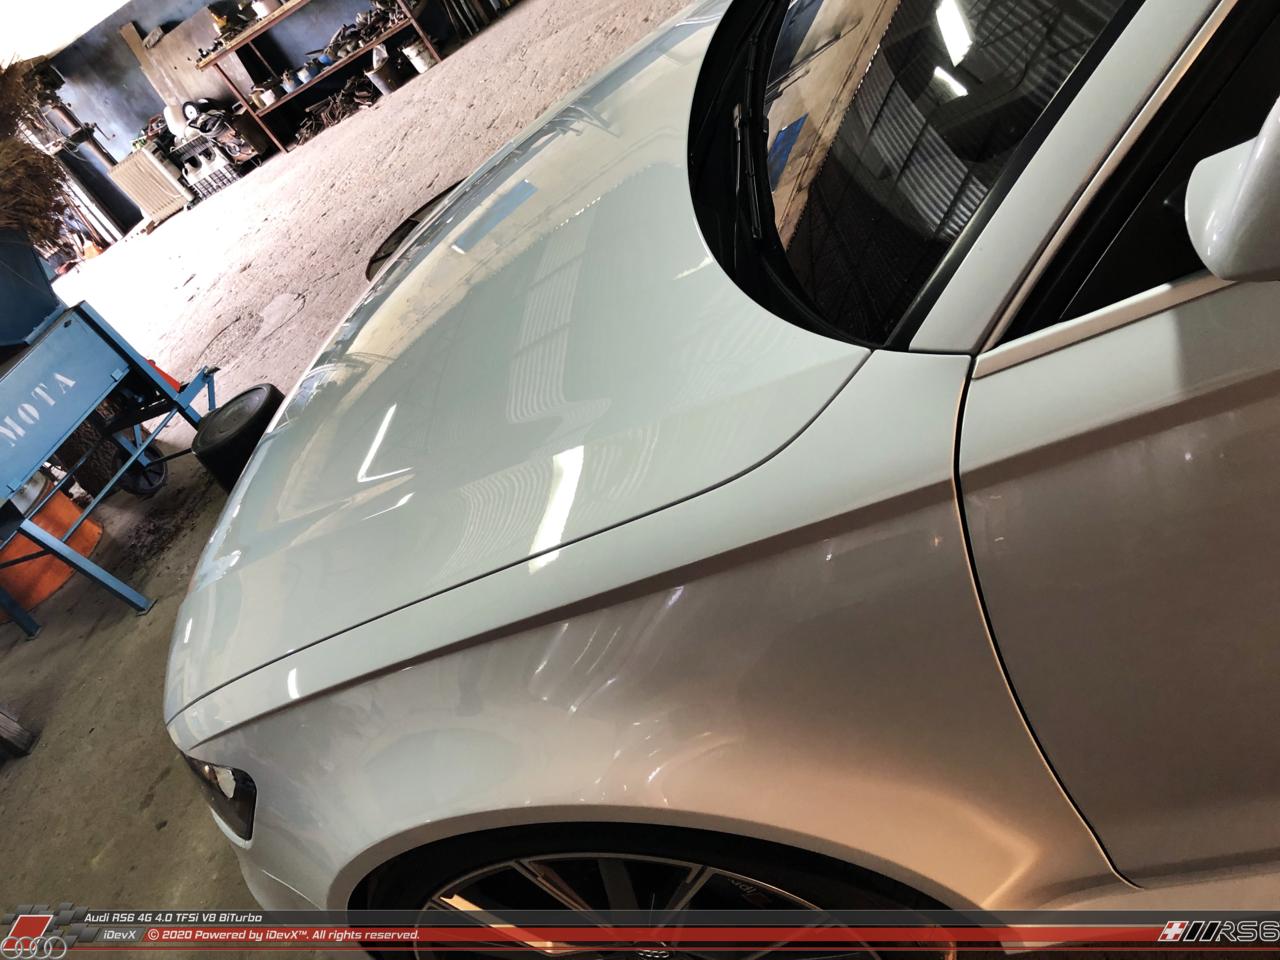 05_08.2019_Audi-RS6_iDevX_006.png